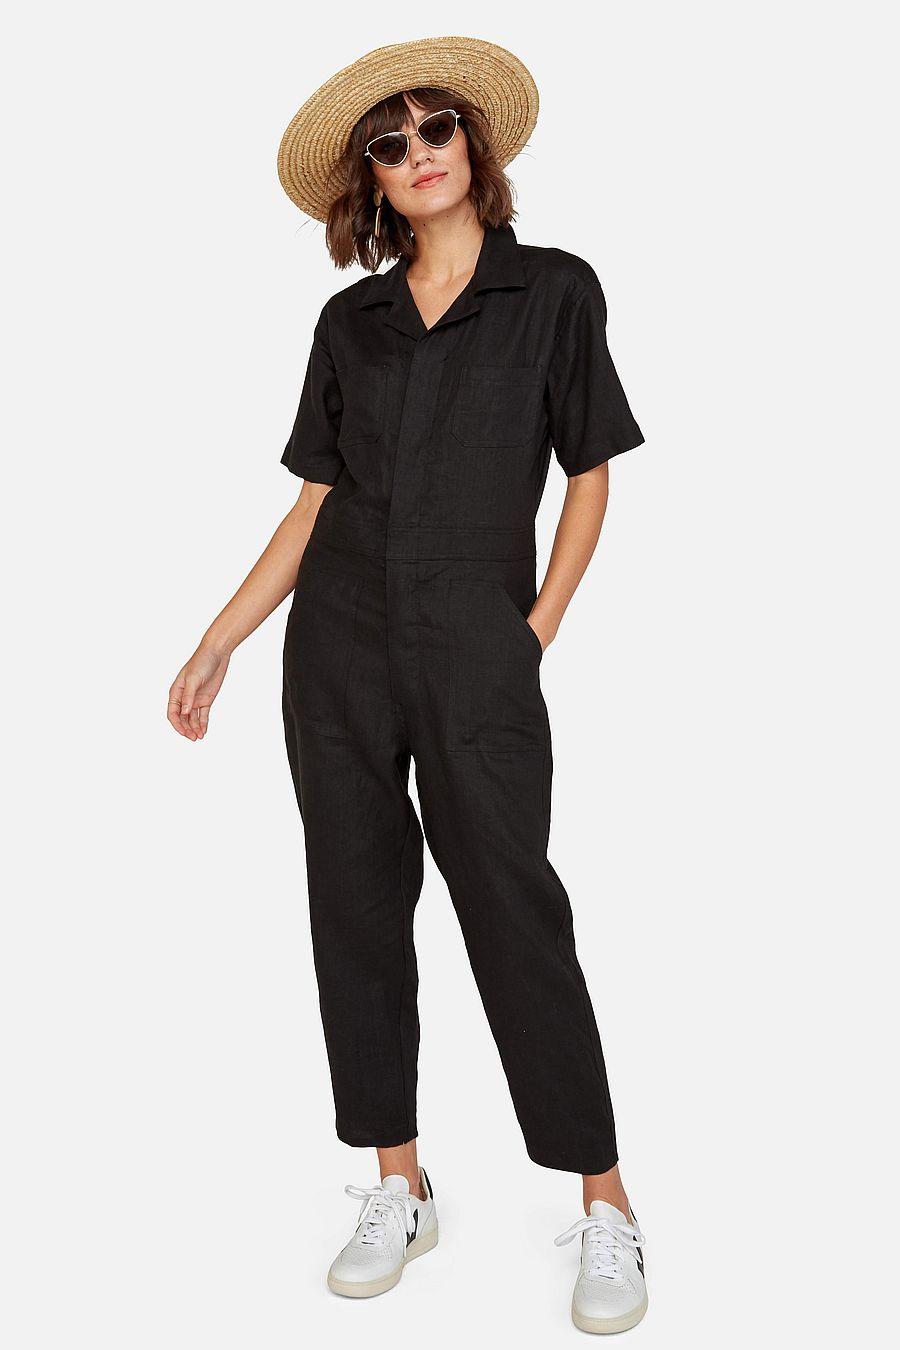 MATE The Label Linen Short Sleeve Jumpsuit - JET BLACK